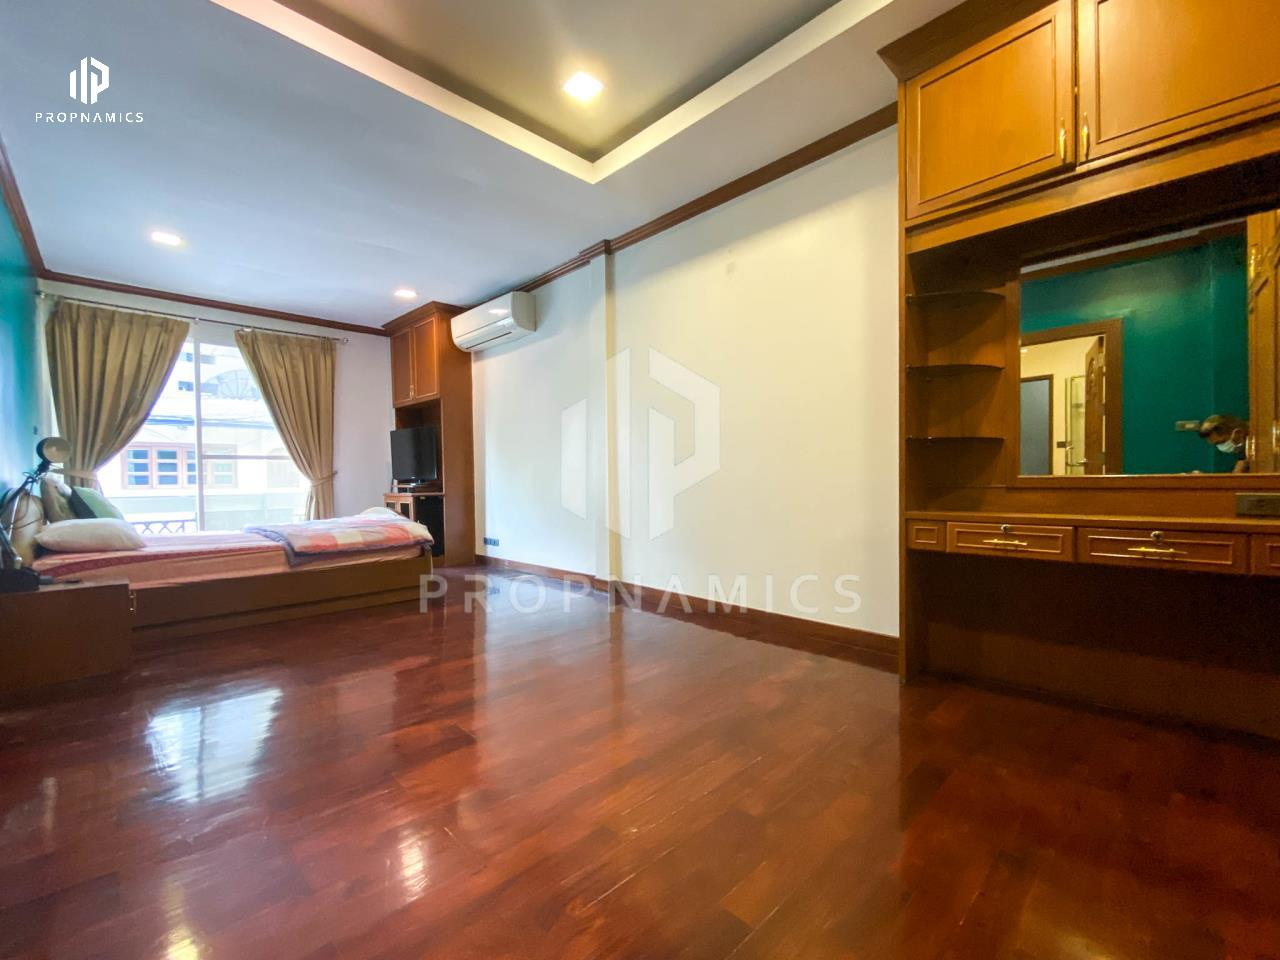 Propnamics Co., Ltd Agency's FOR RENT: SINGLE HOUSE IN SUKHUMVIT 26 15